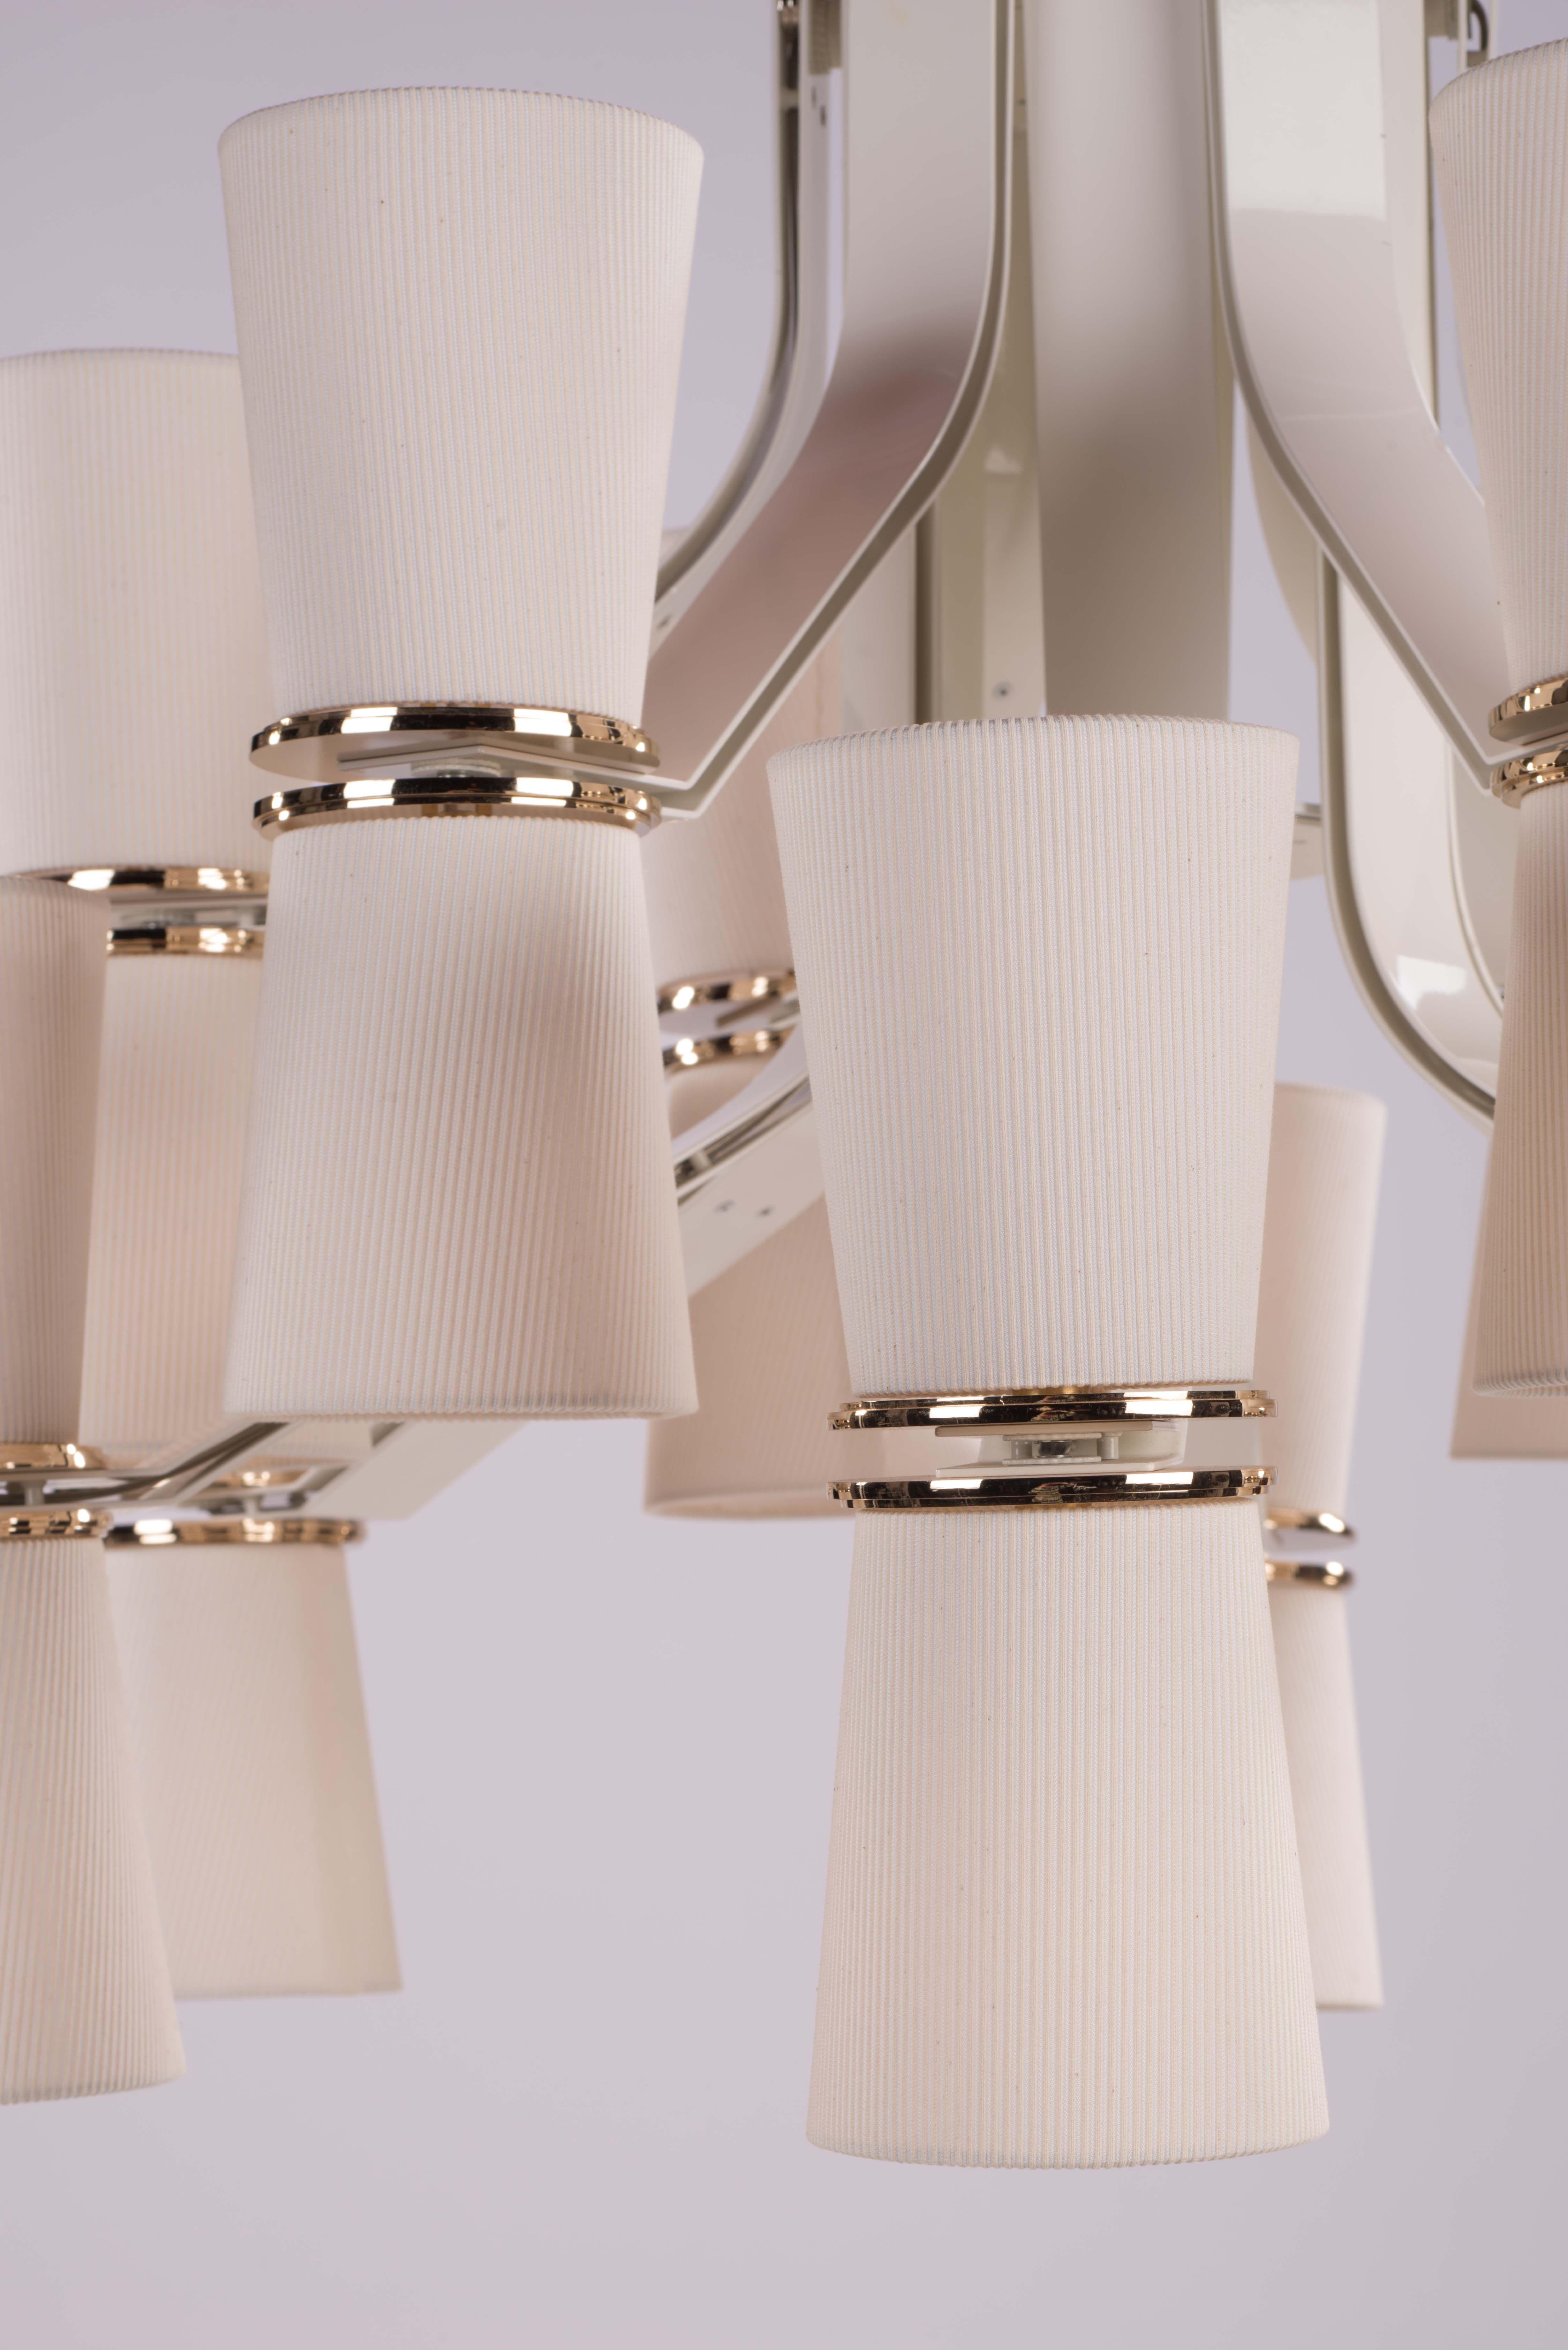 MUSE chandelier close up Lampade, Cristalli, Verona